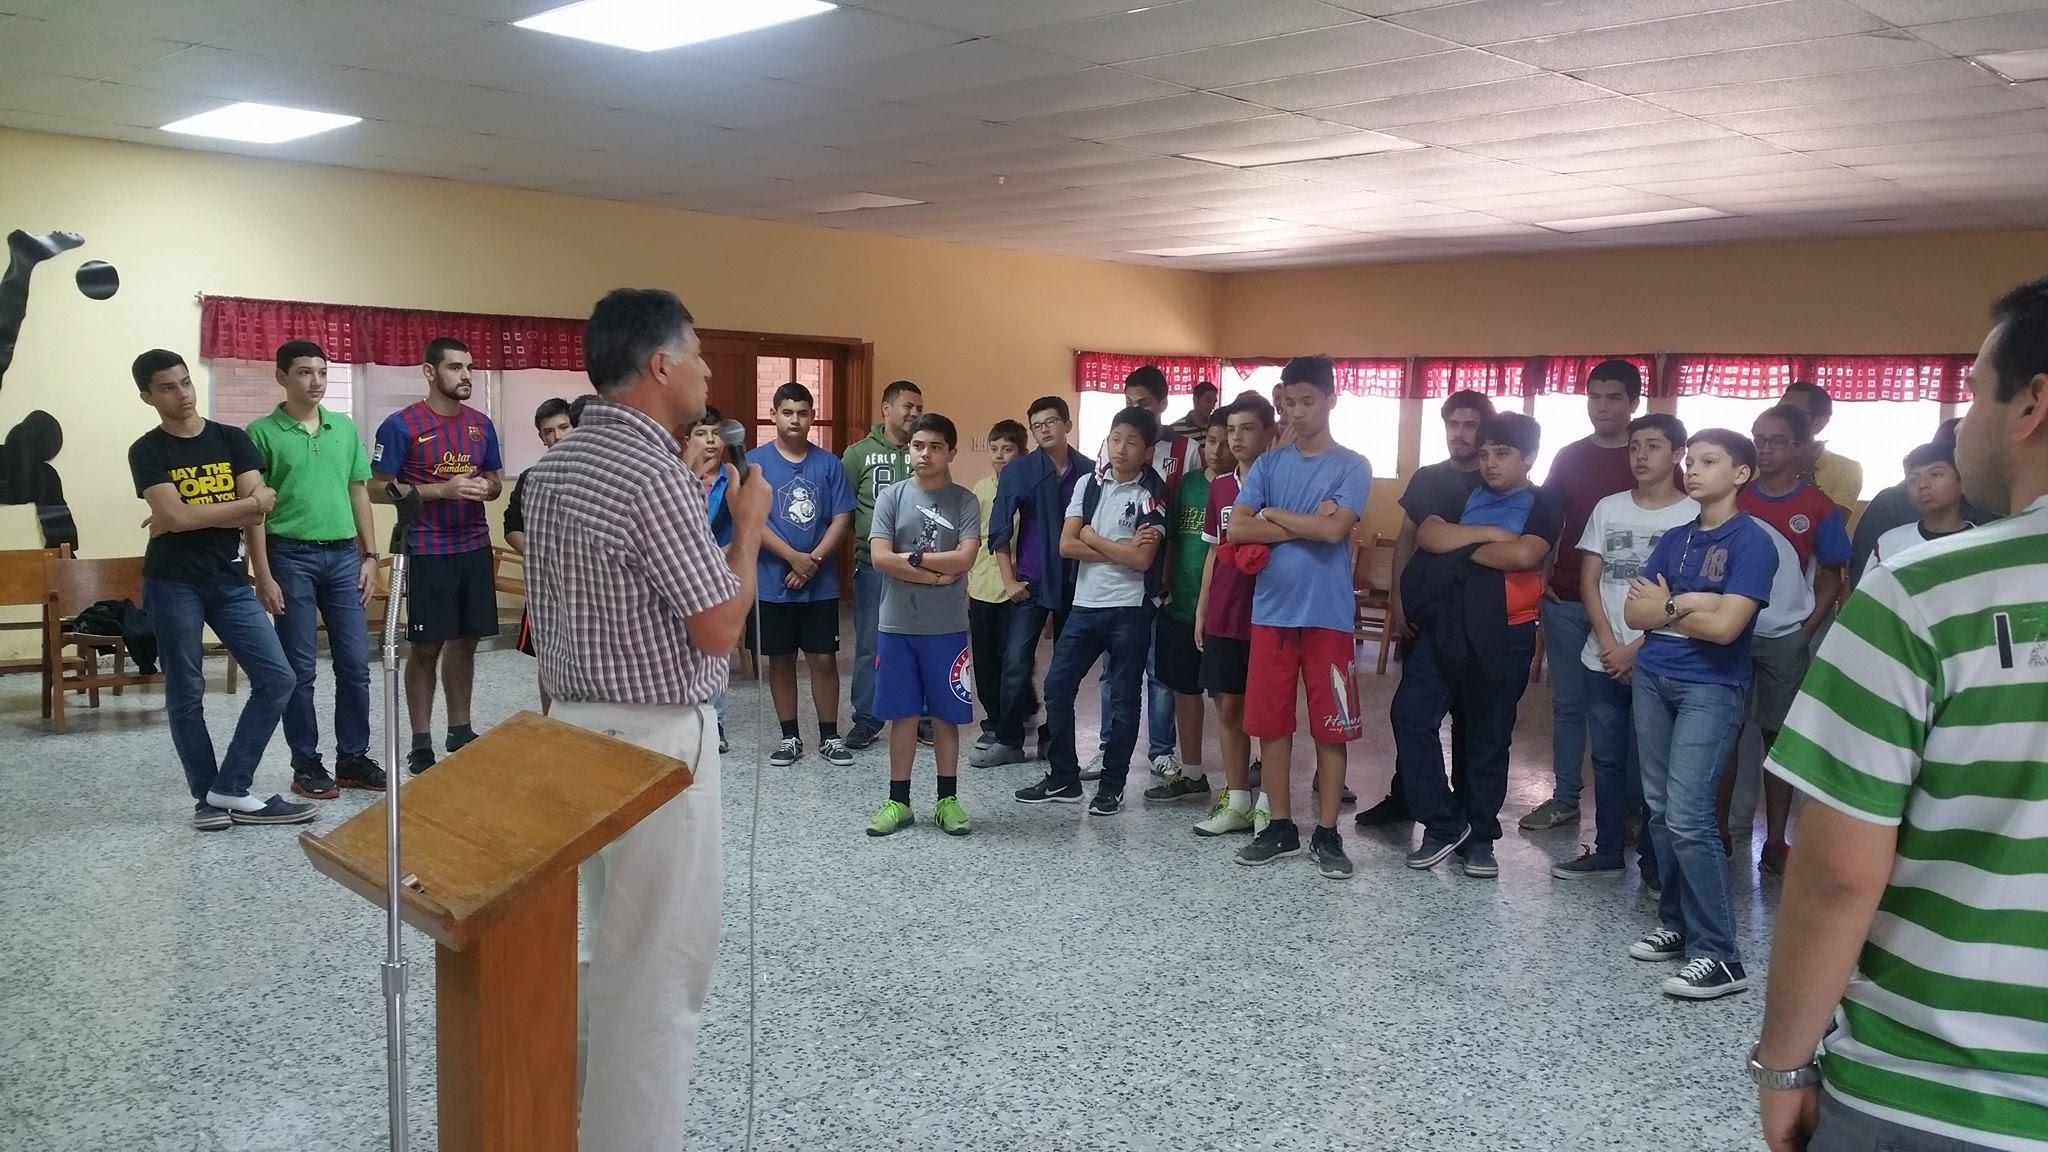 2016.01.4al8 - Conferencia Adolescentes en Tegucigalpa (Honduras) (10).jpg